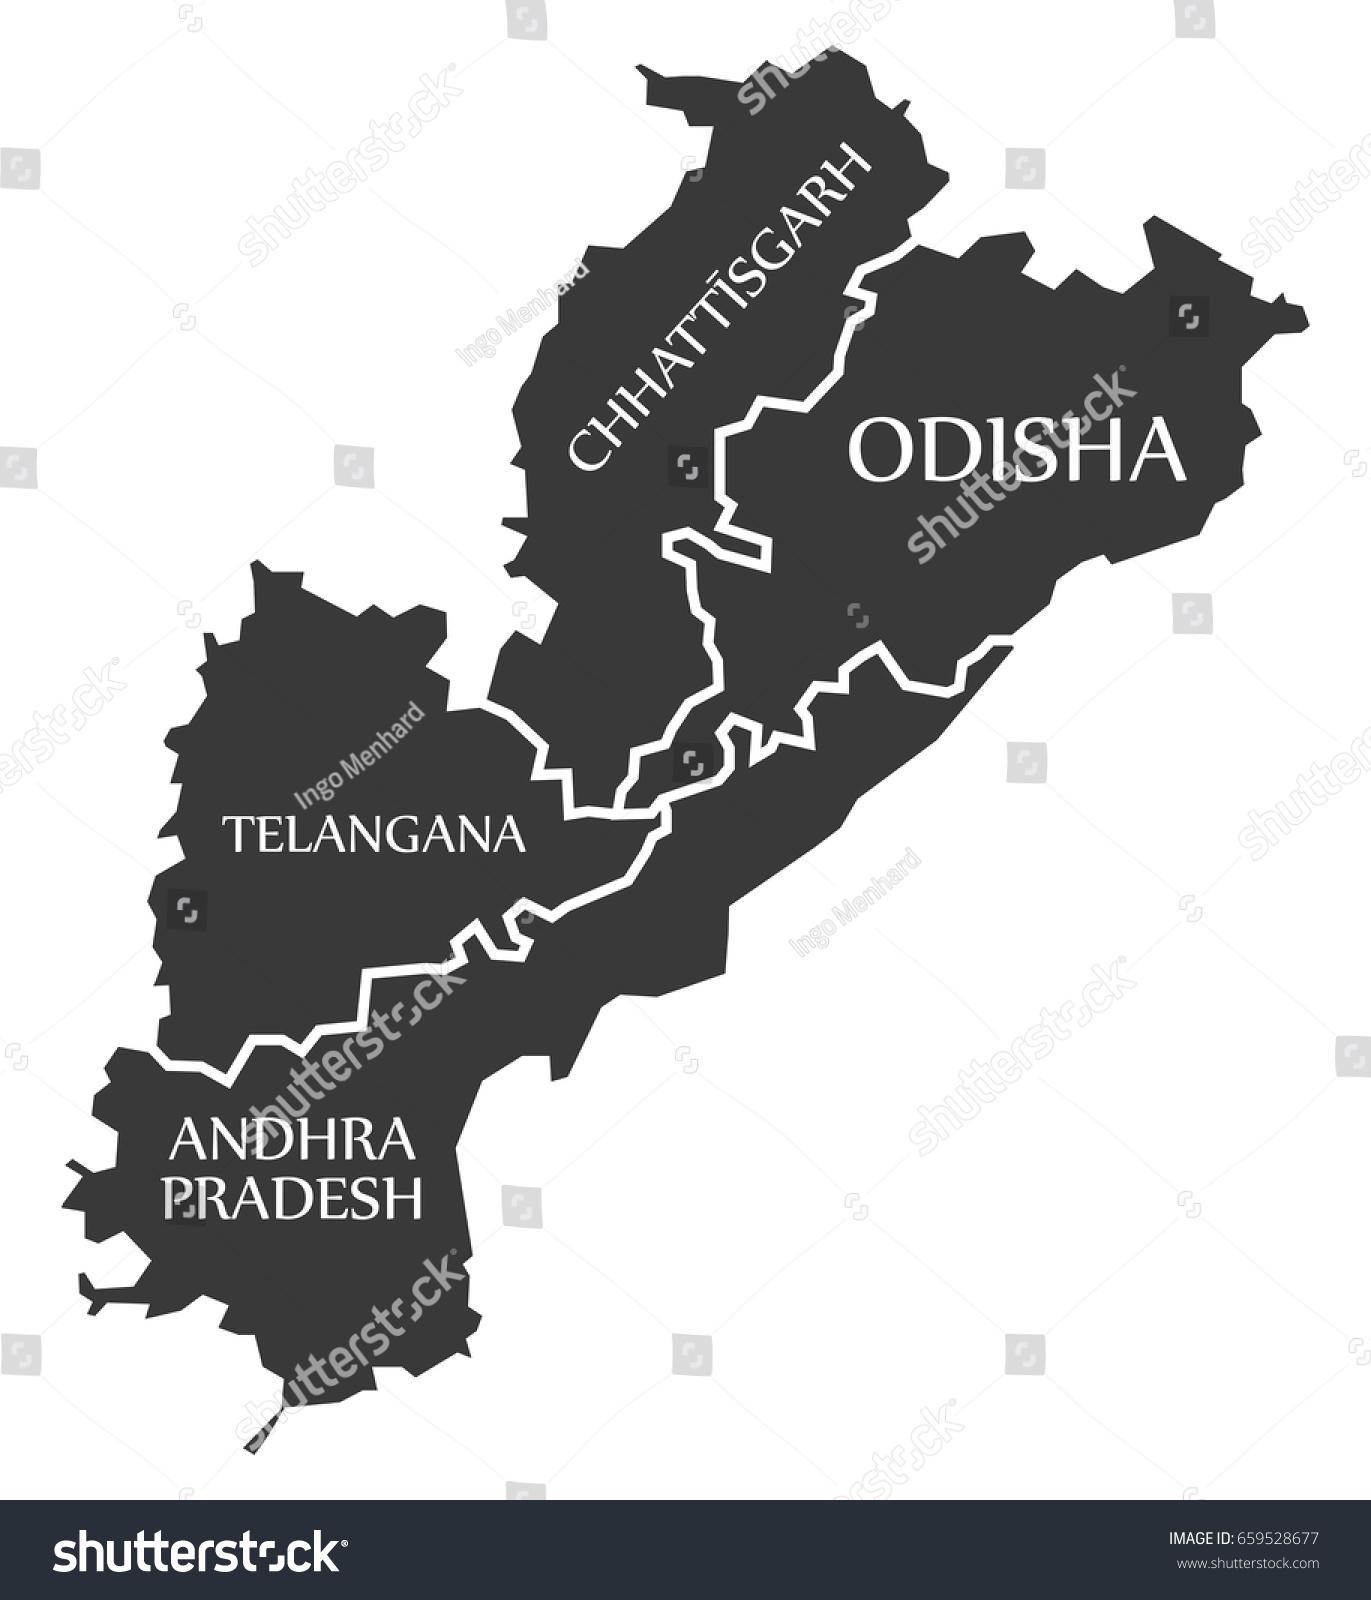 Andhra Pradesh Telangana Chhattisgarh Odisha Map Stock Vector ...